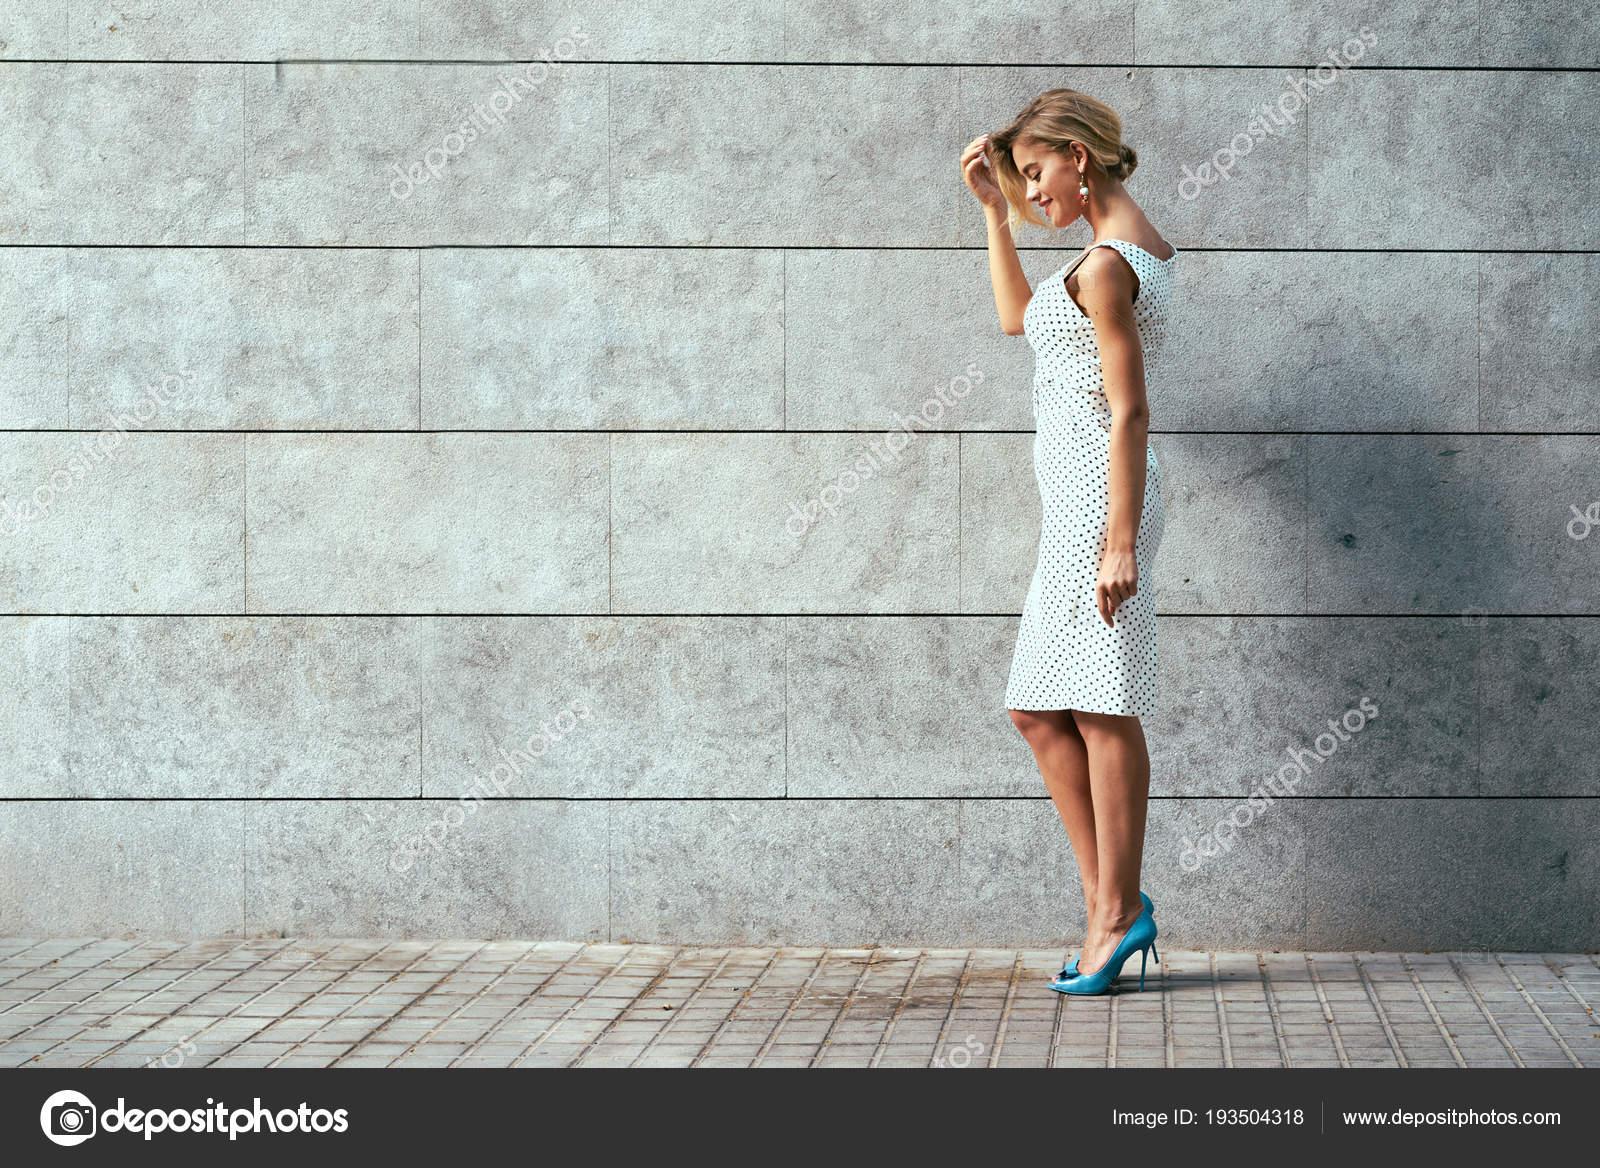 9a1c28242c5a Όμορφη Ξανθιά Γυναίκα Στο Λευκό Κοντό Φόρεμα Μαύρο Πουά Και — Φωτογραφία  Αρχείου